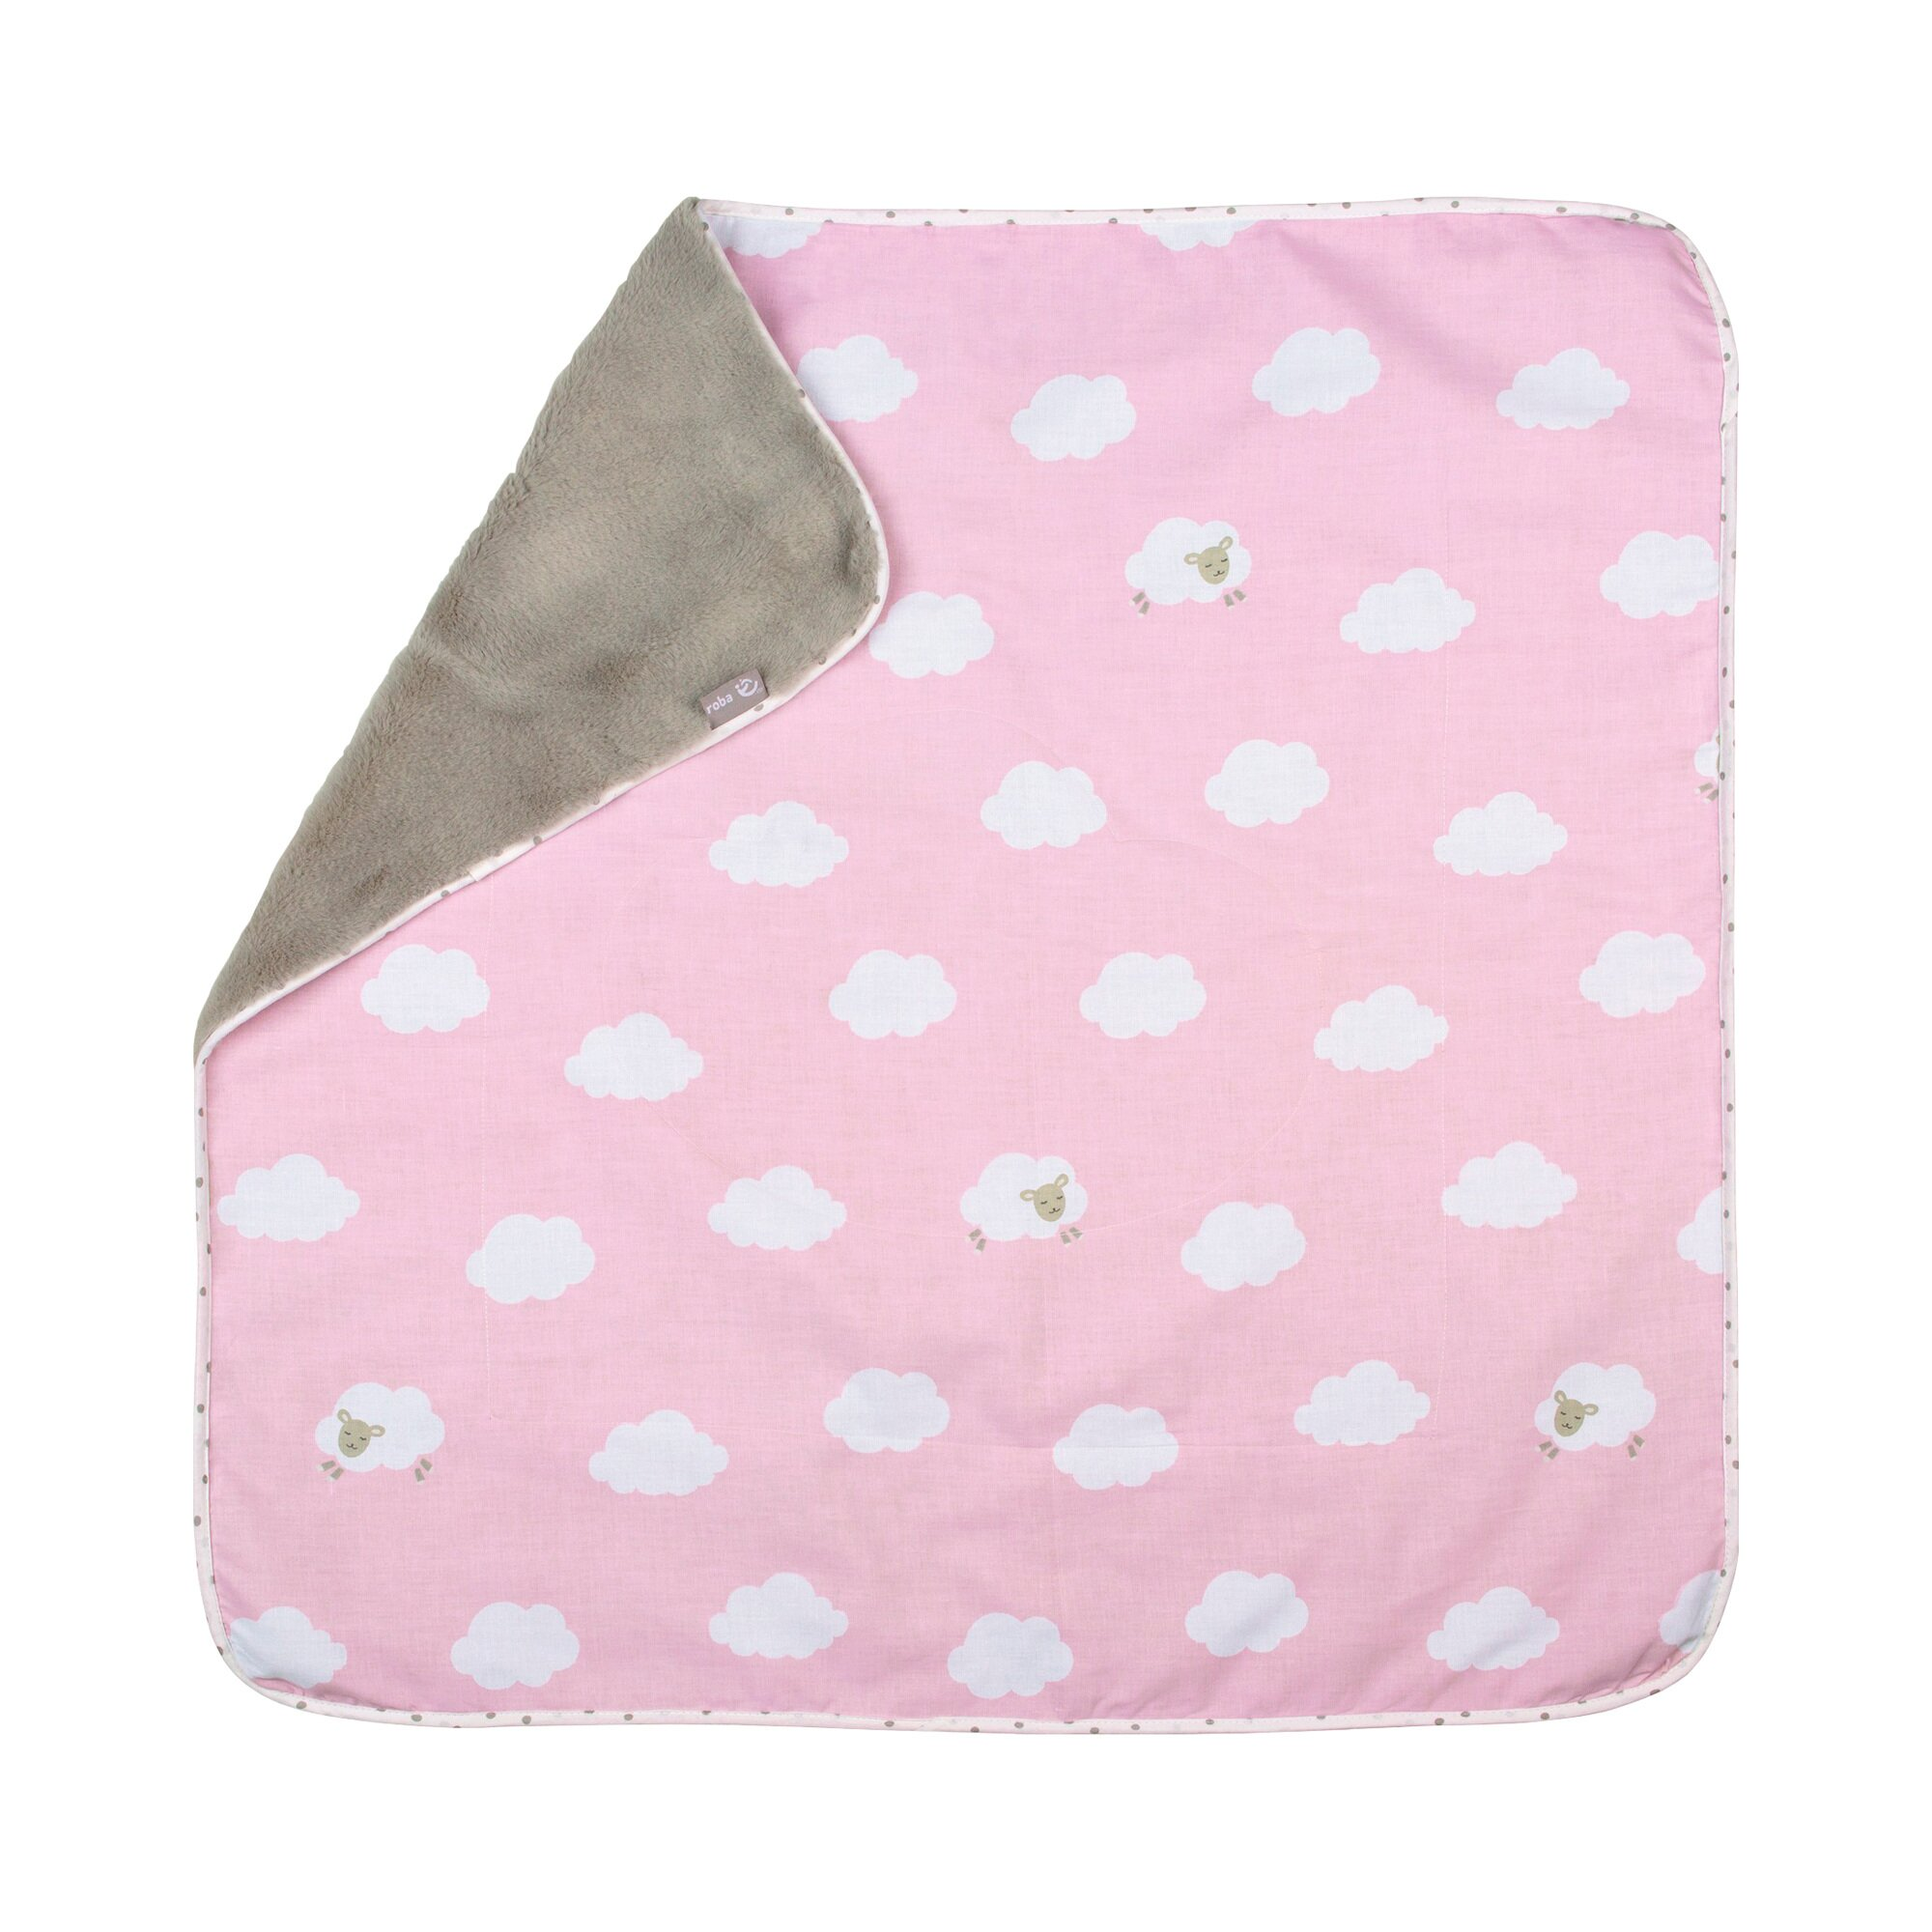 roba-babydecke-80x80-cm-rosa